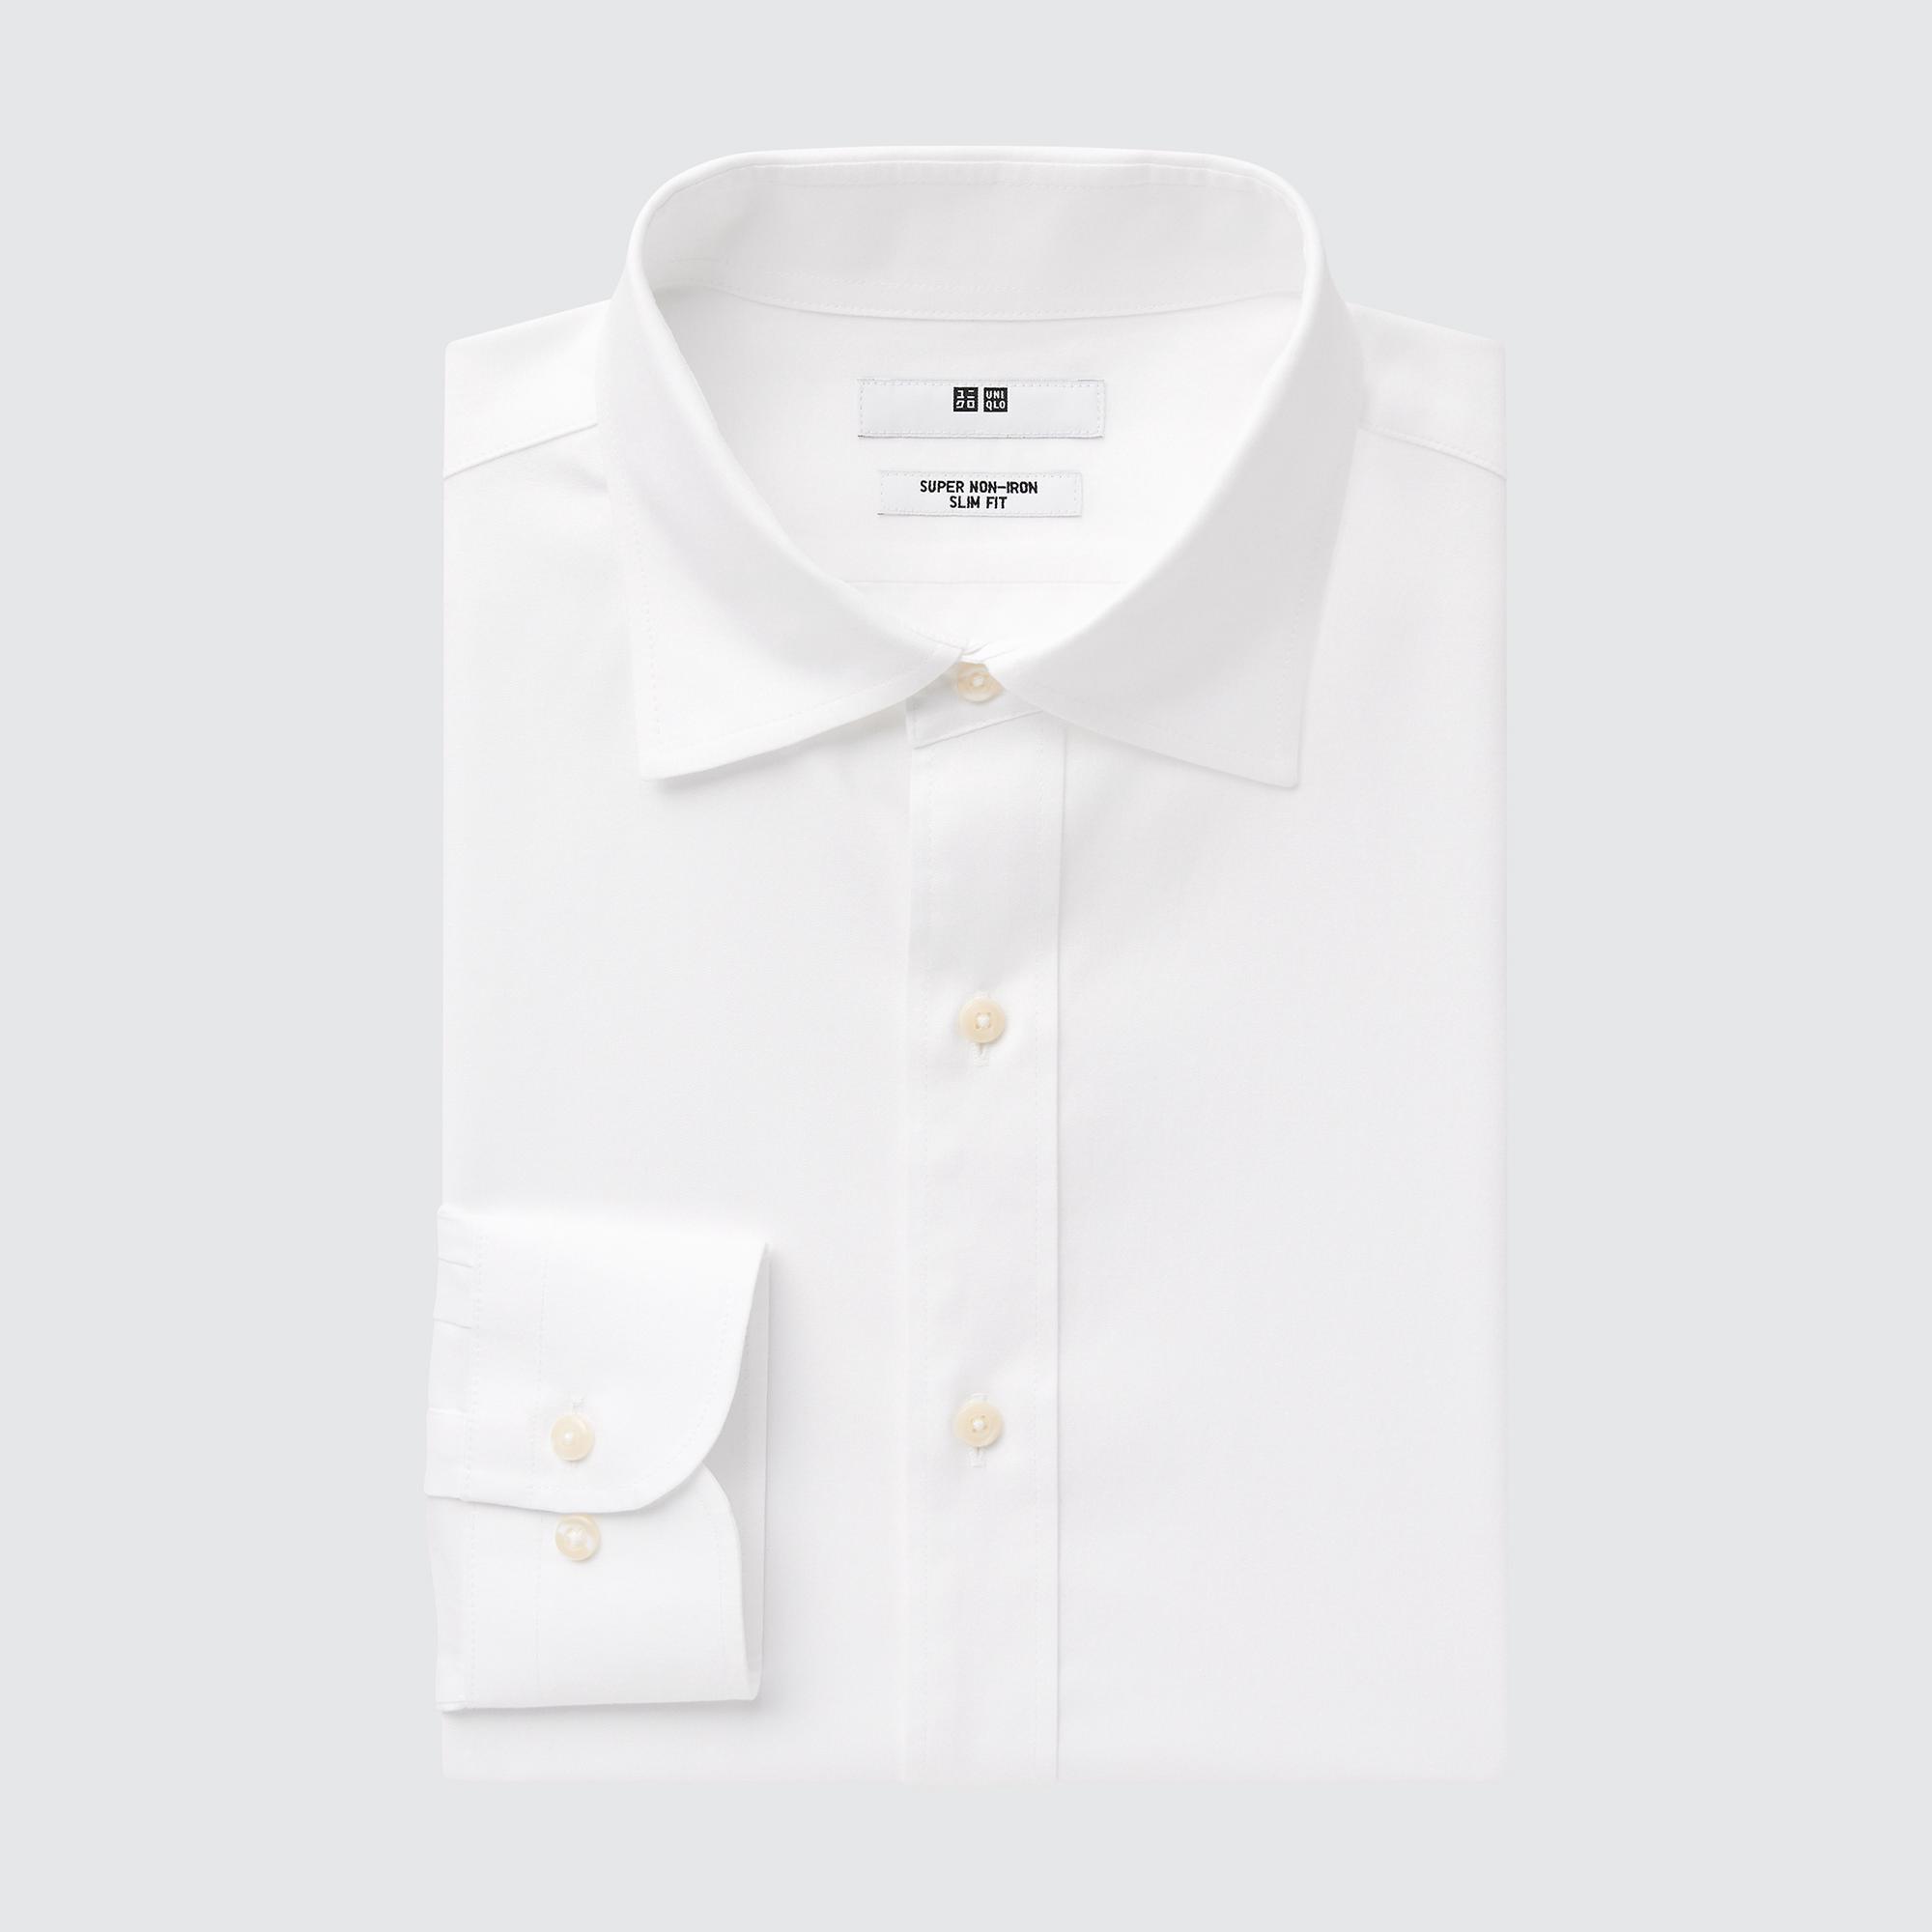 Uniqlo men super non-iron slim-fit long-sleeve shirt